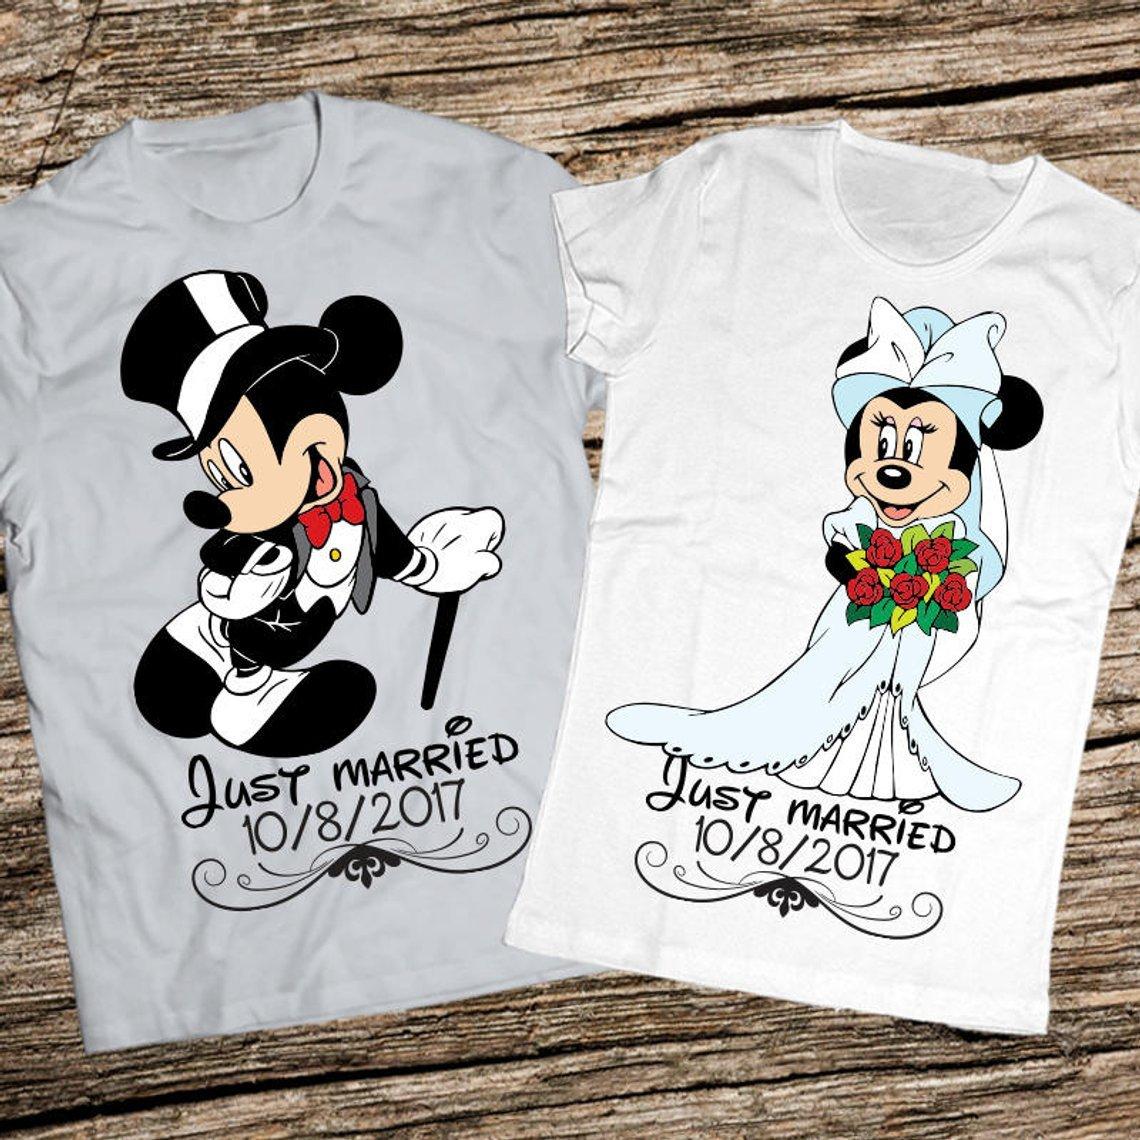 Just Married Mickey & Minnie Tees